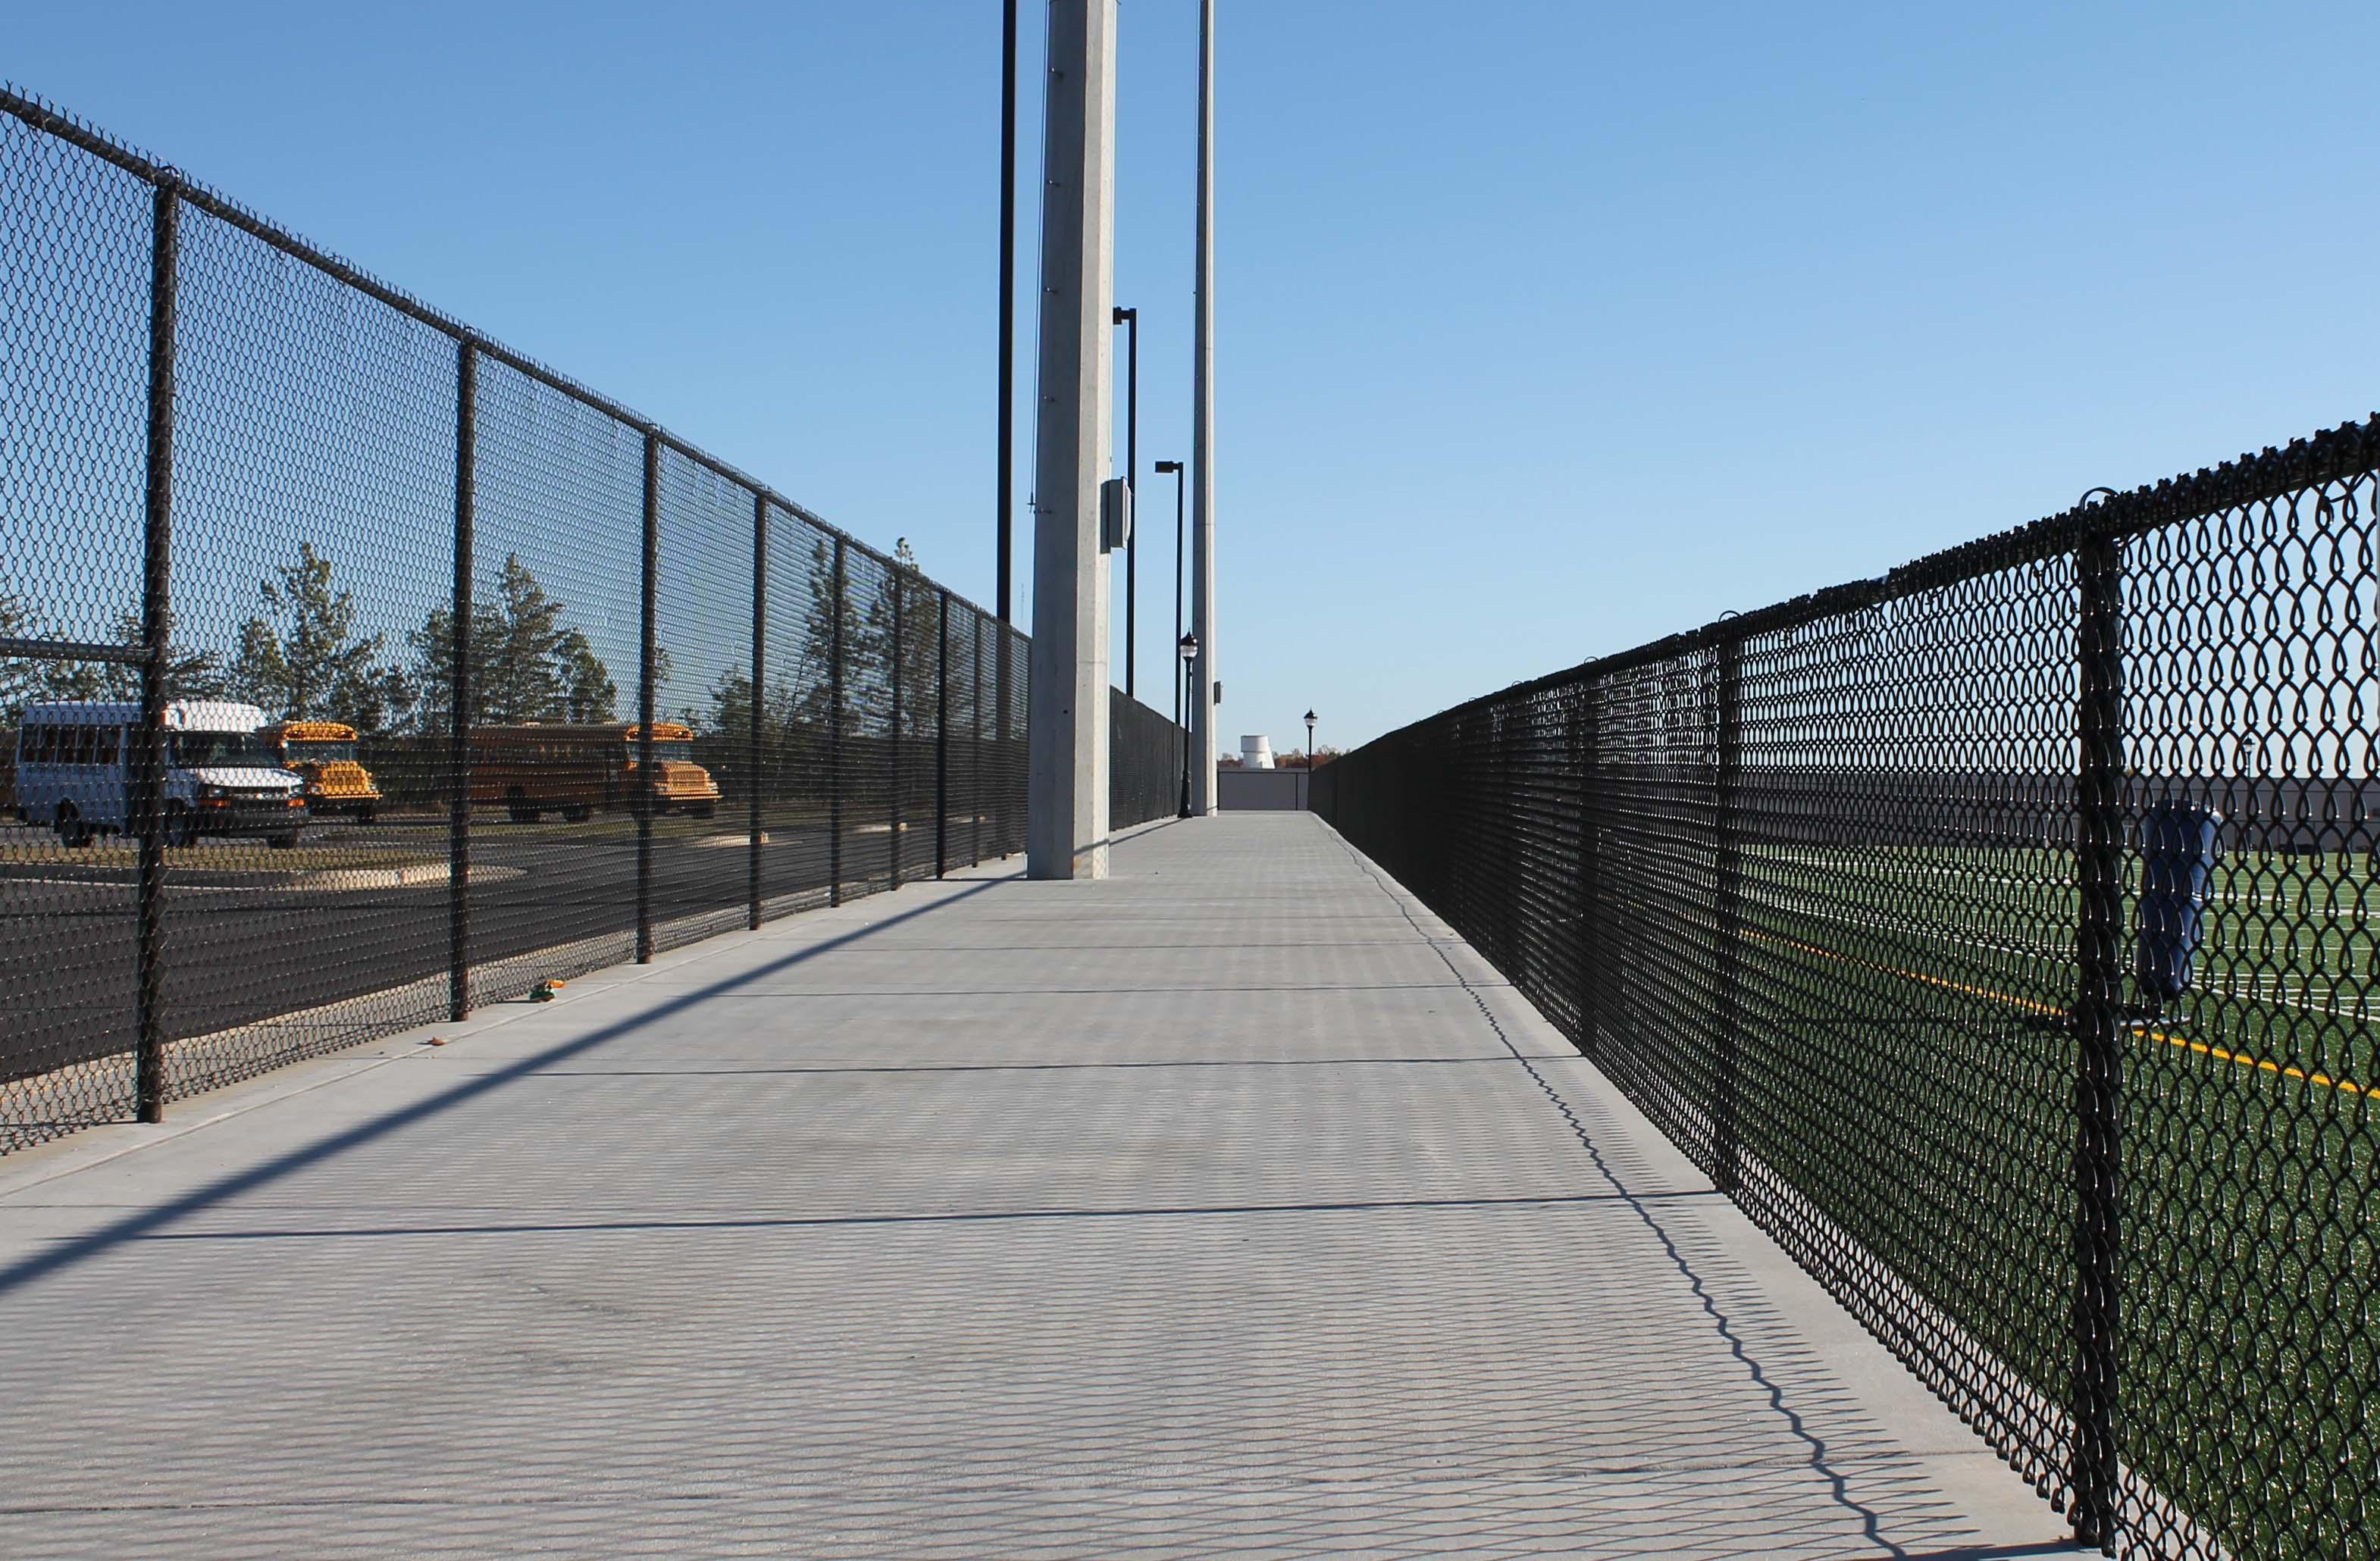 commercial grade chain link fencing allentown bethlehem pa.jpg